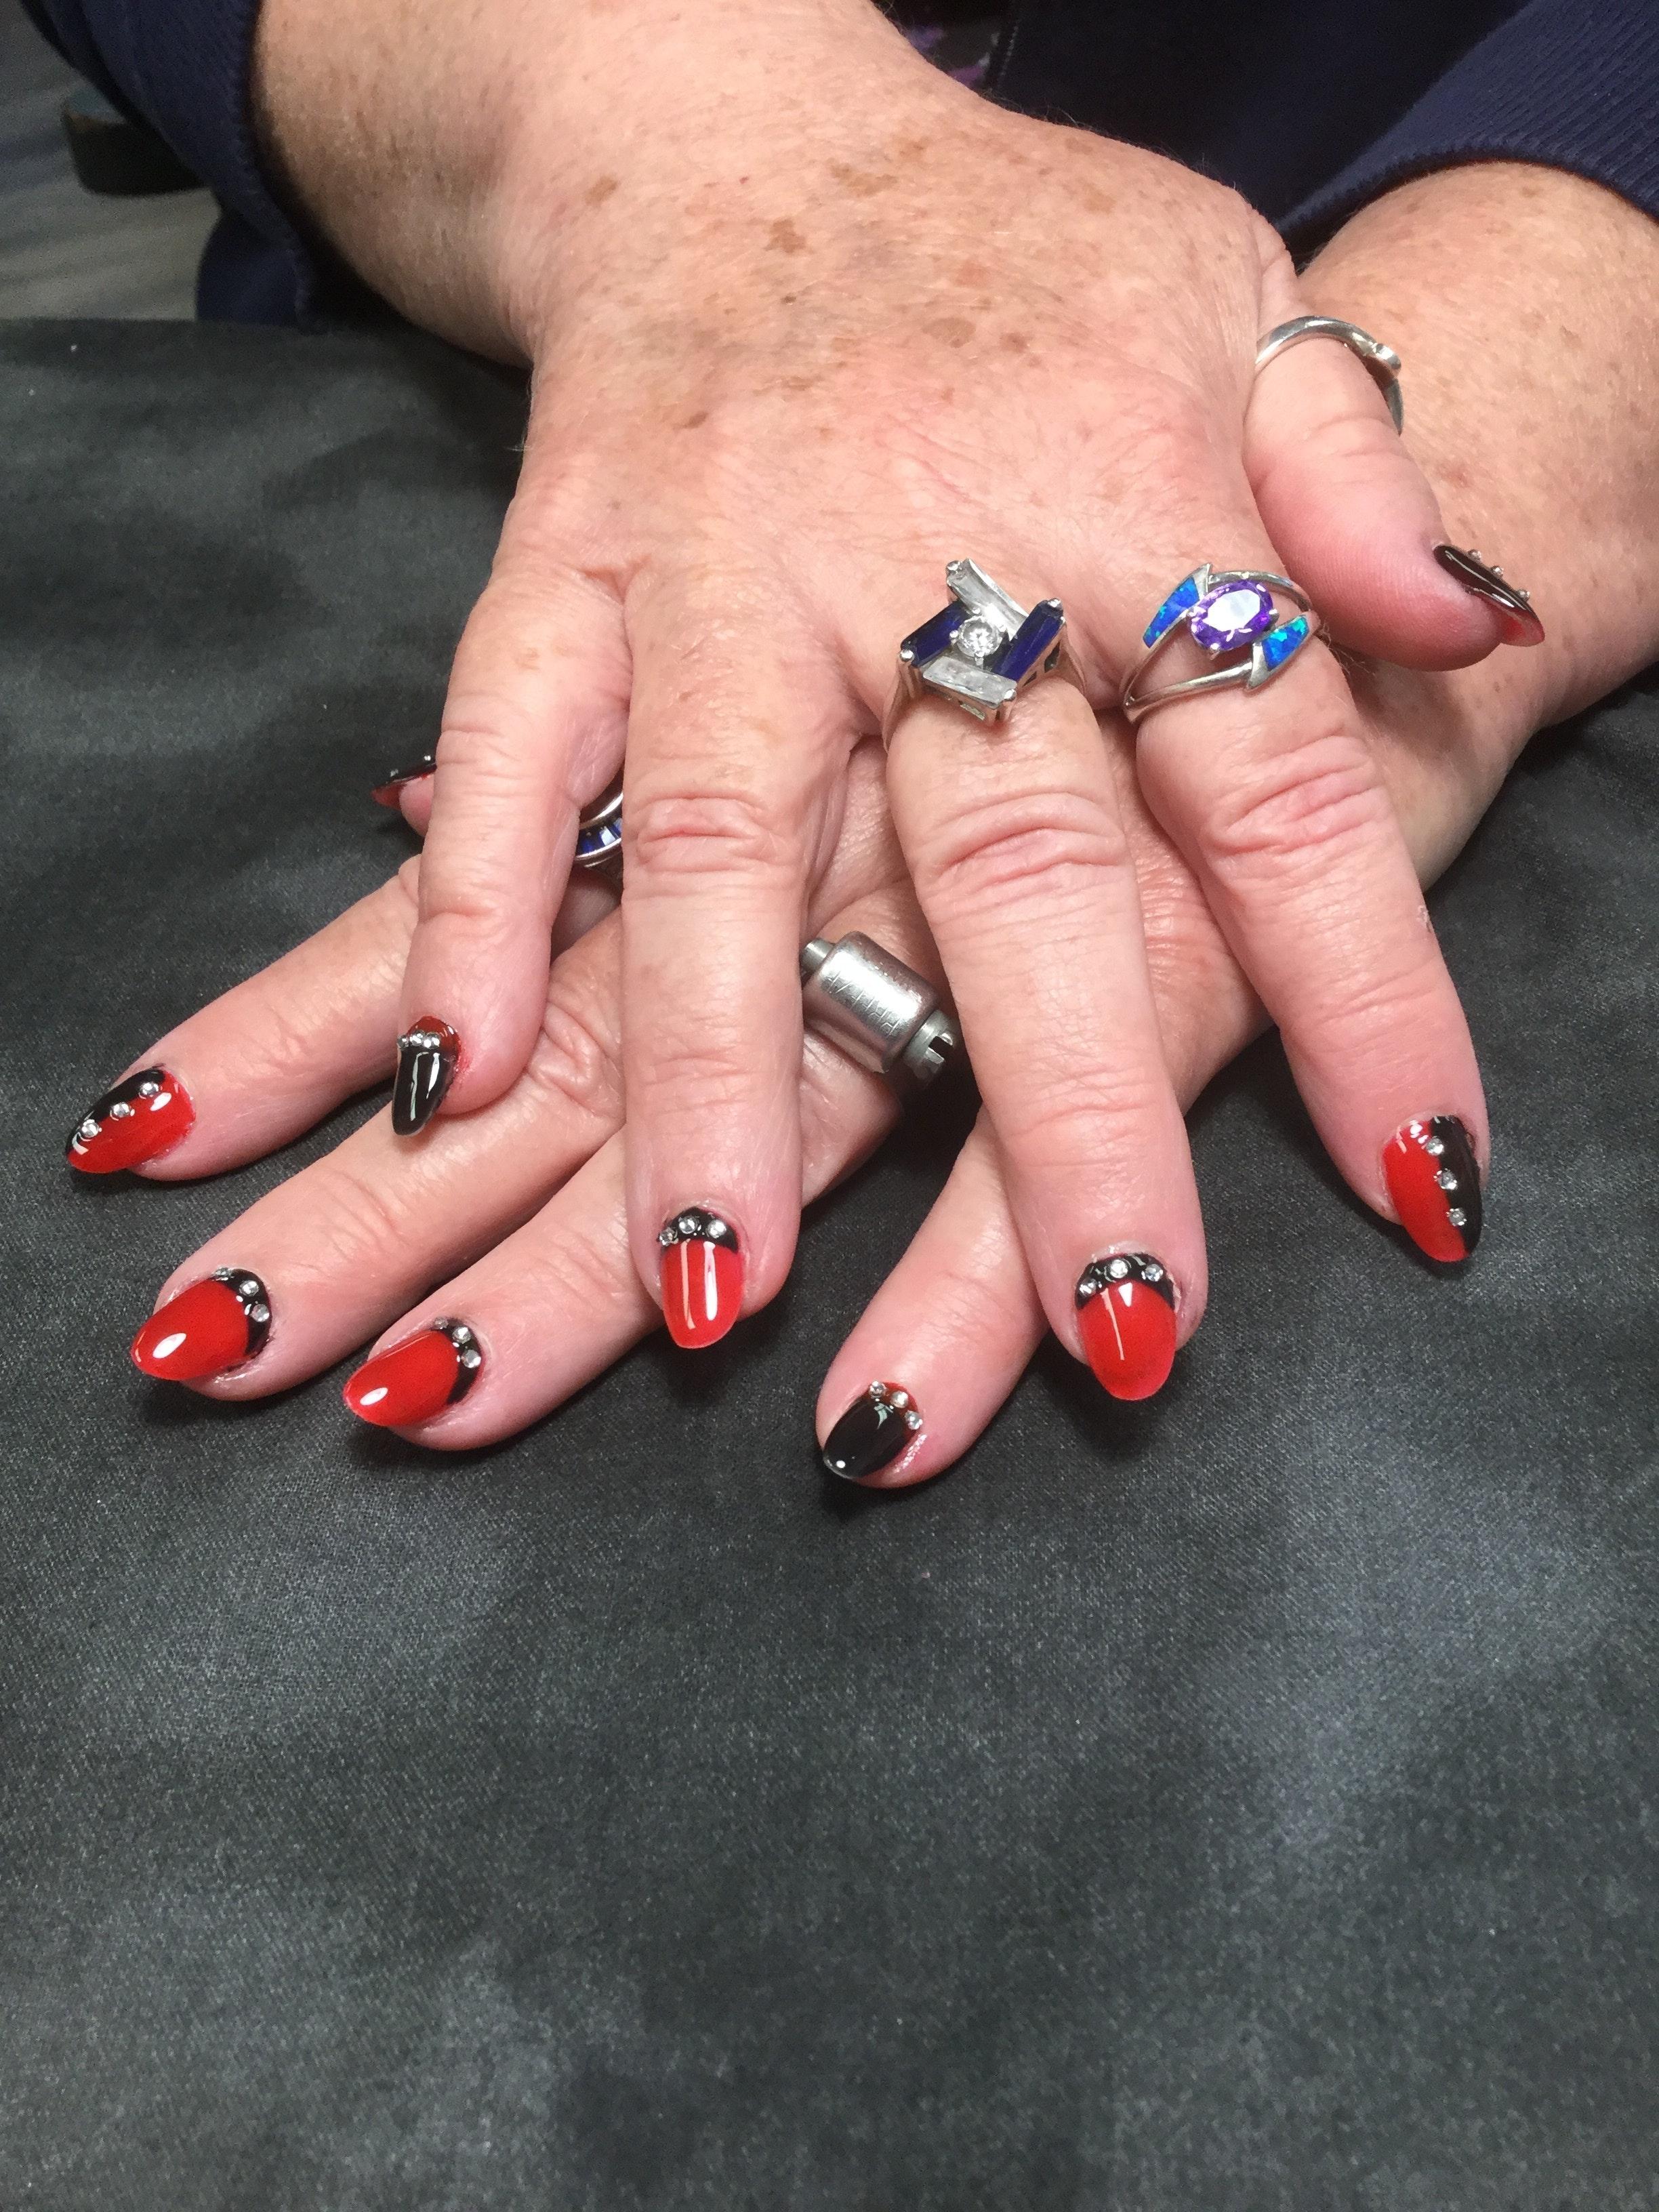 Free stock photo of Blacknrednails, Nails gel nails